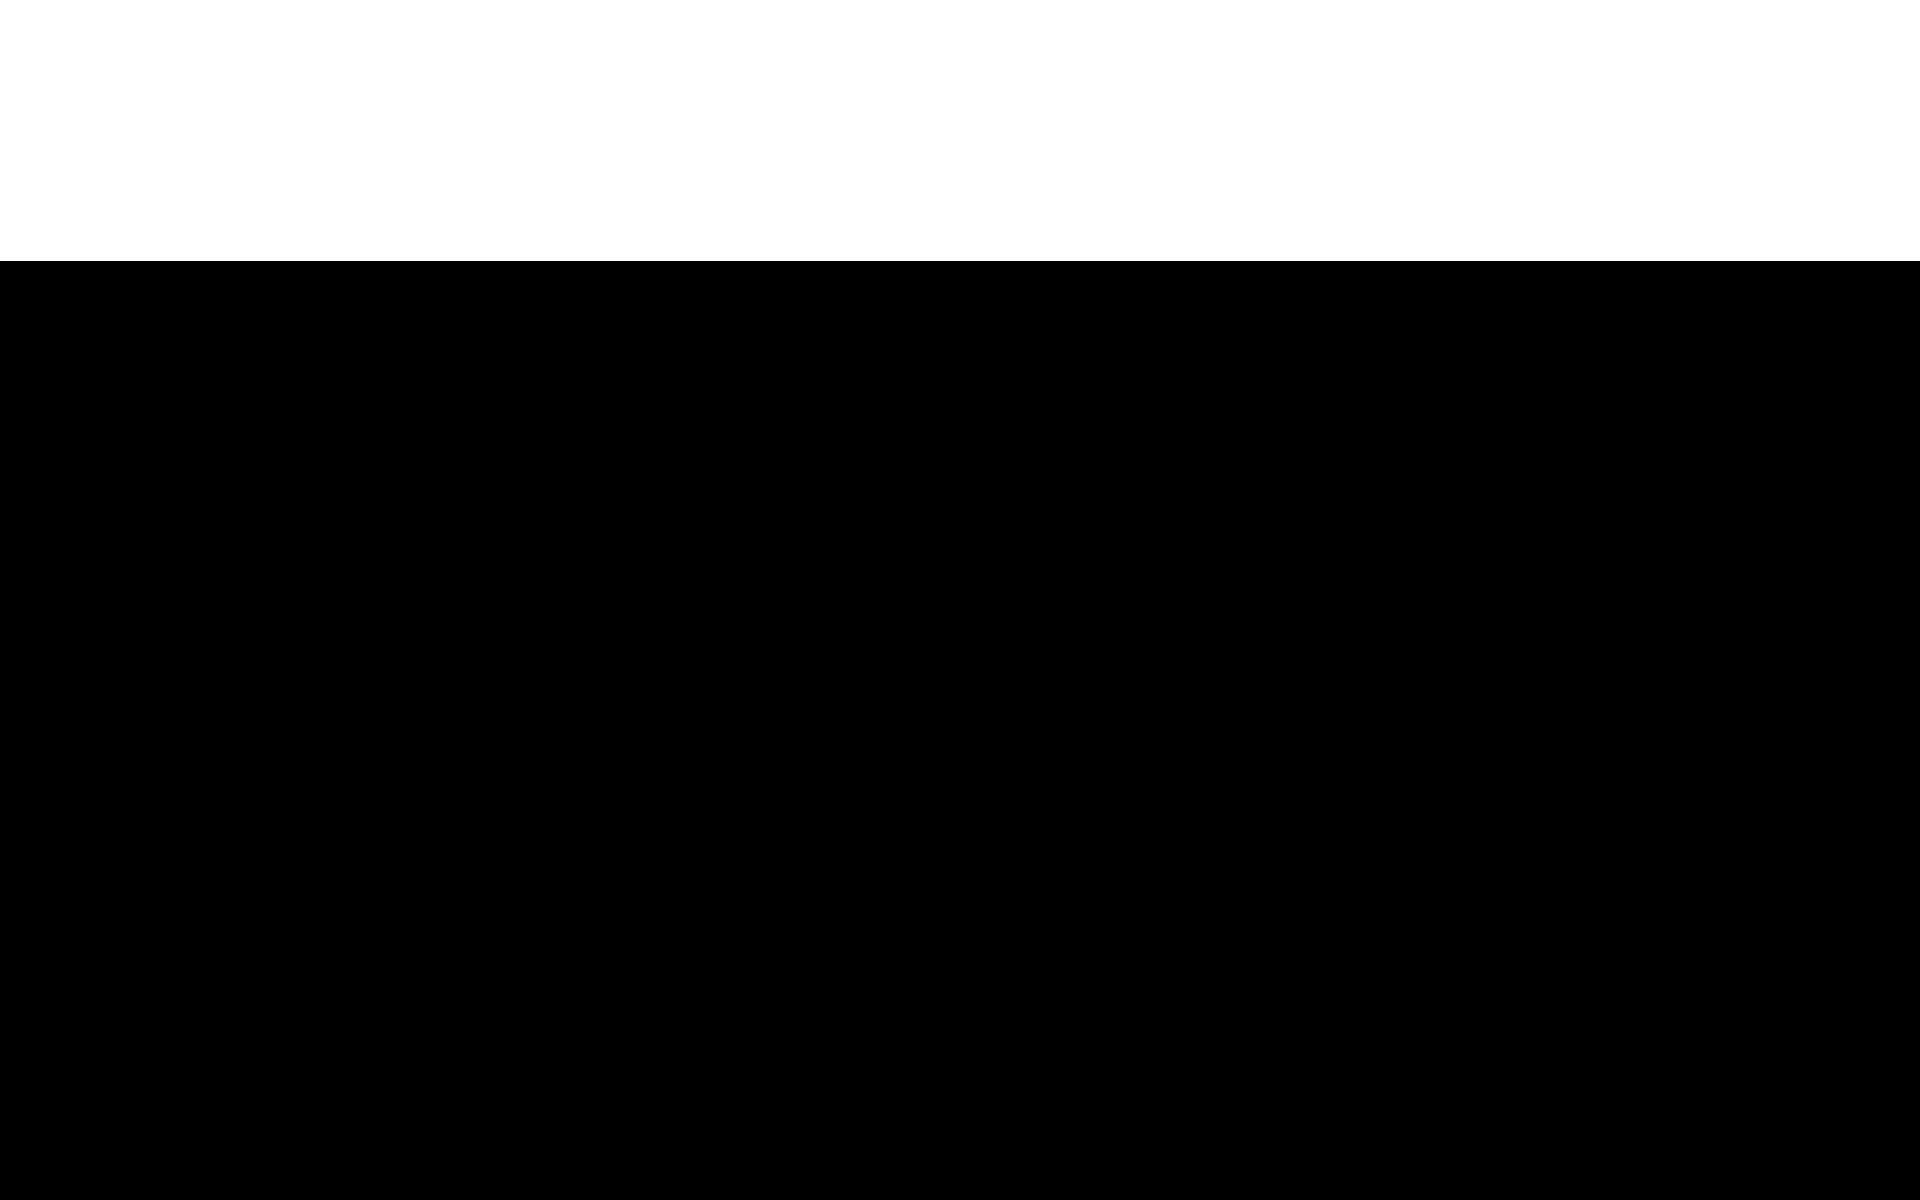 Gradient overlay